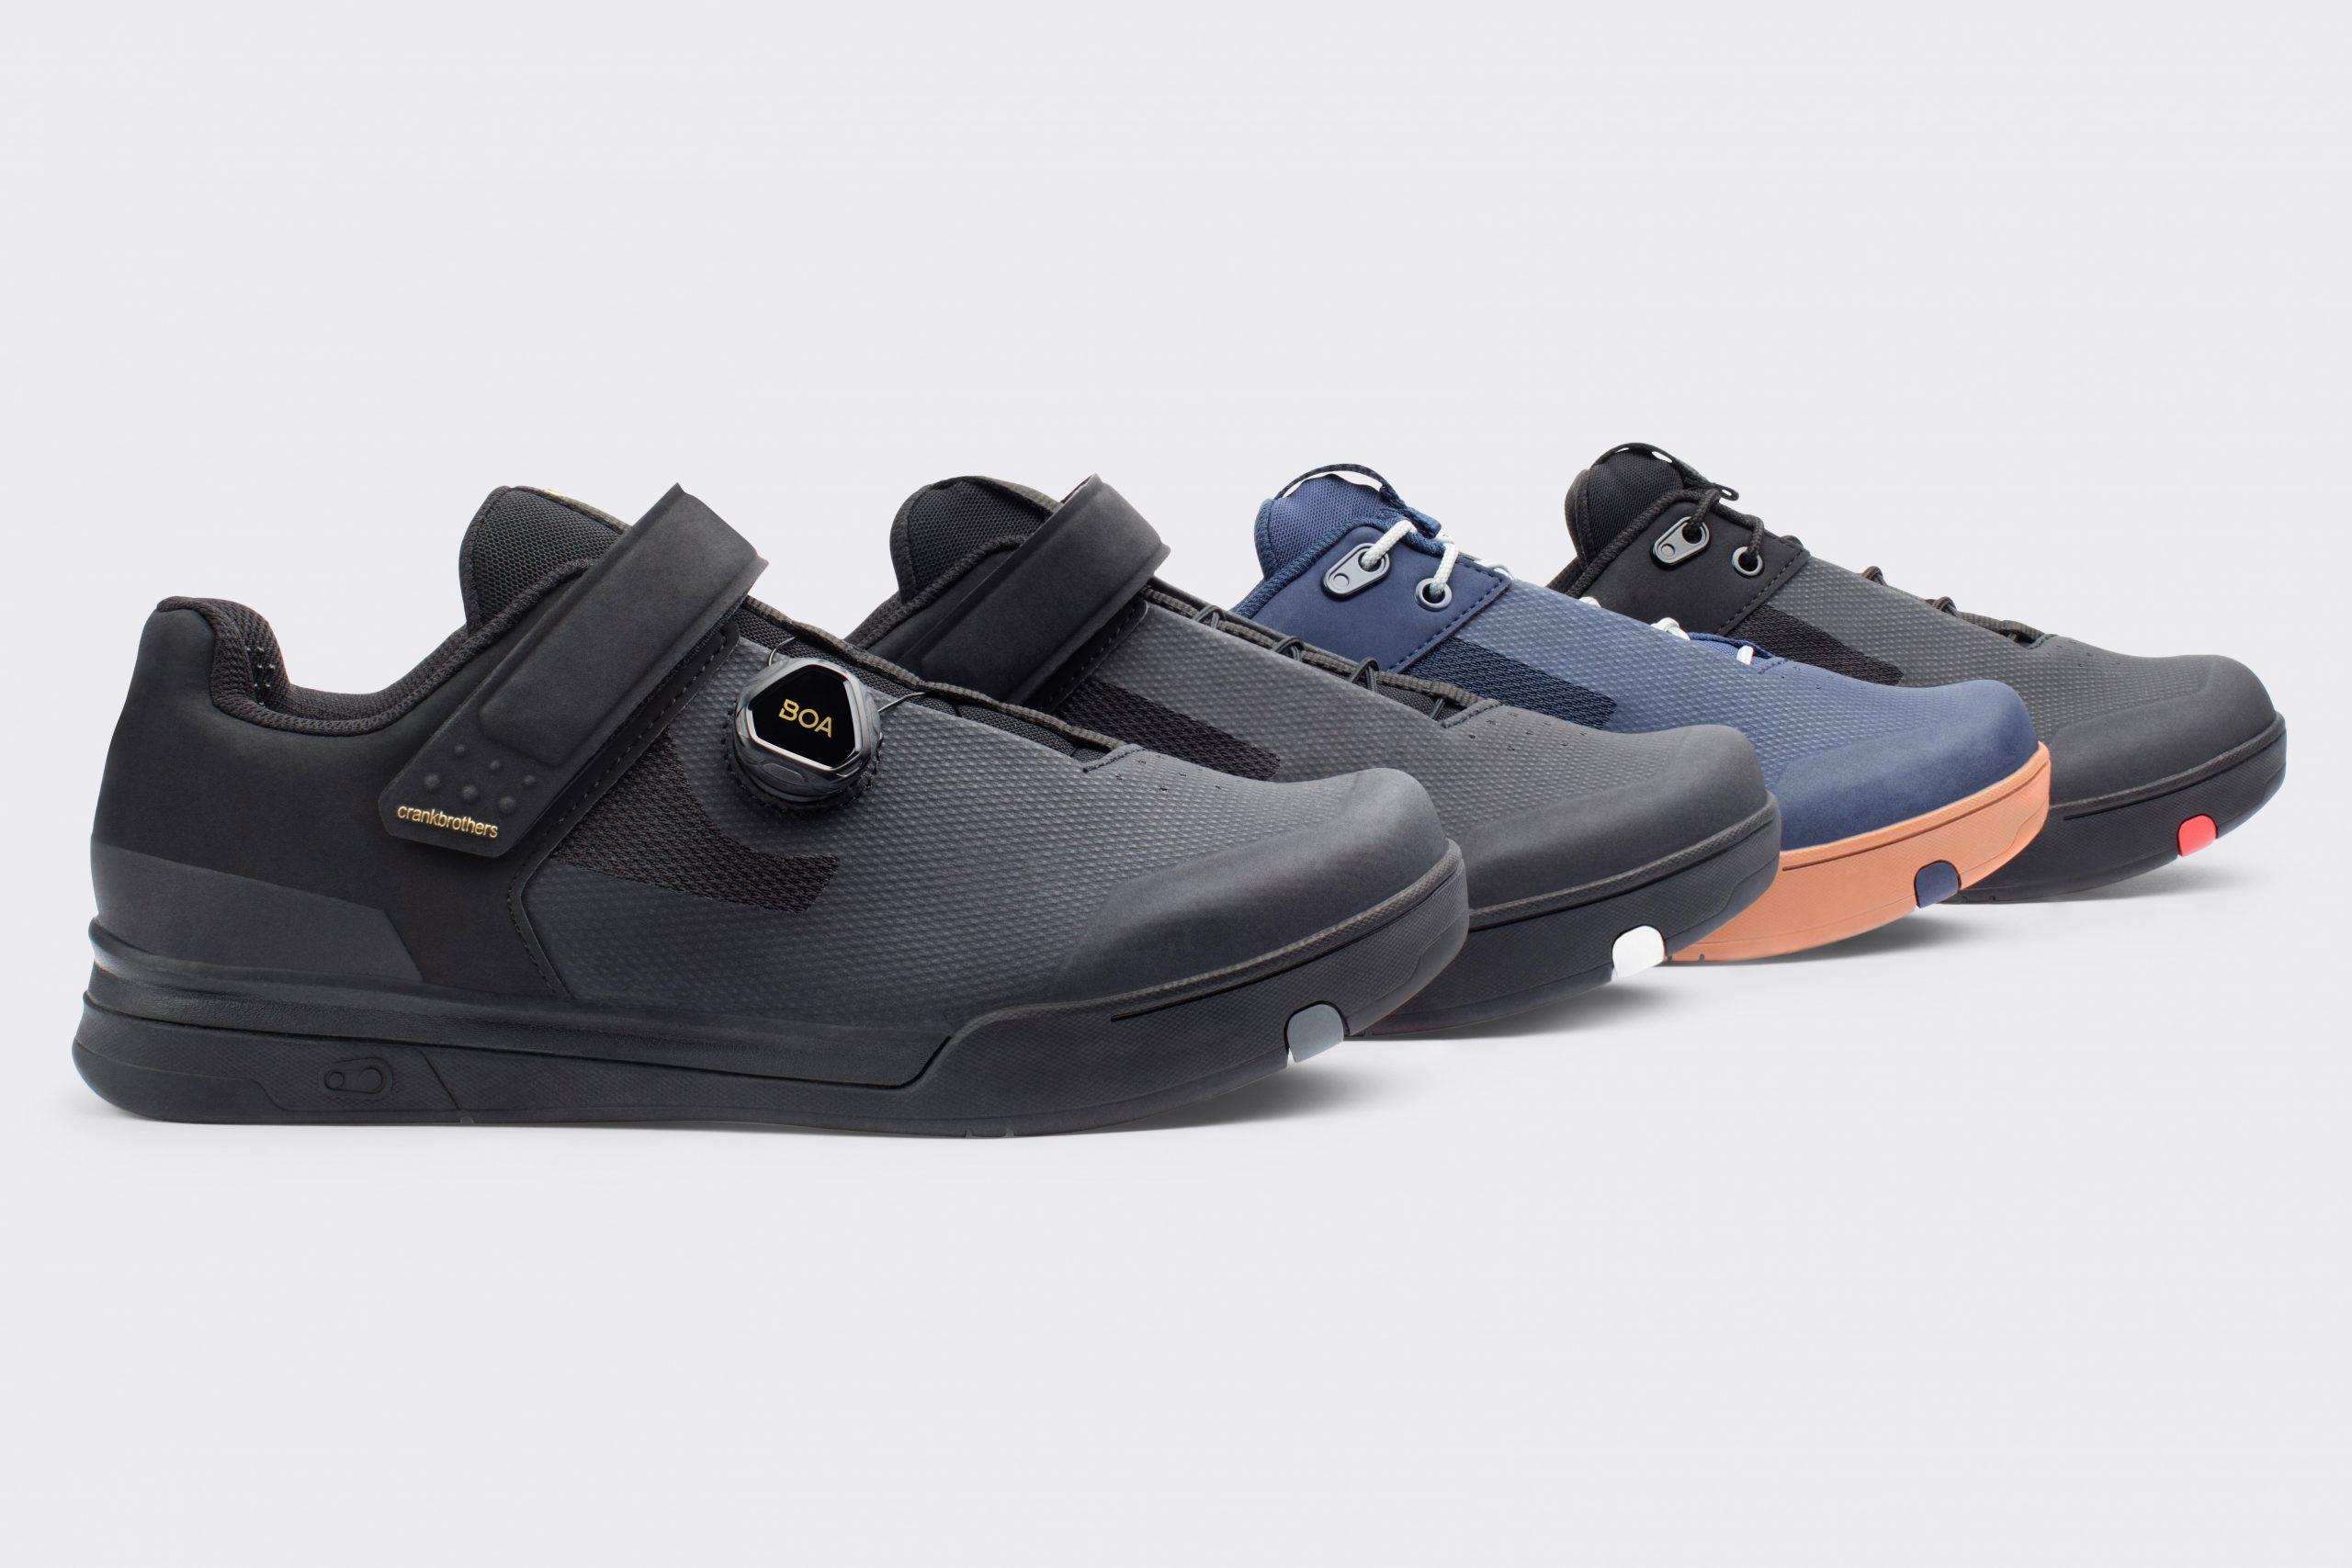 Good Vibrations Shoes (GVSI) Stock Makes a Big Move On Massive Volume